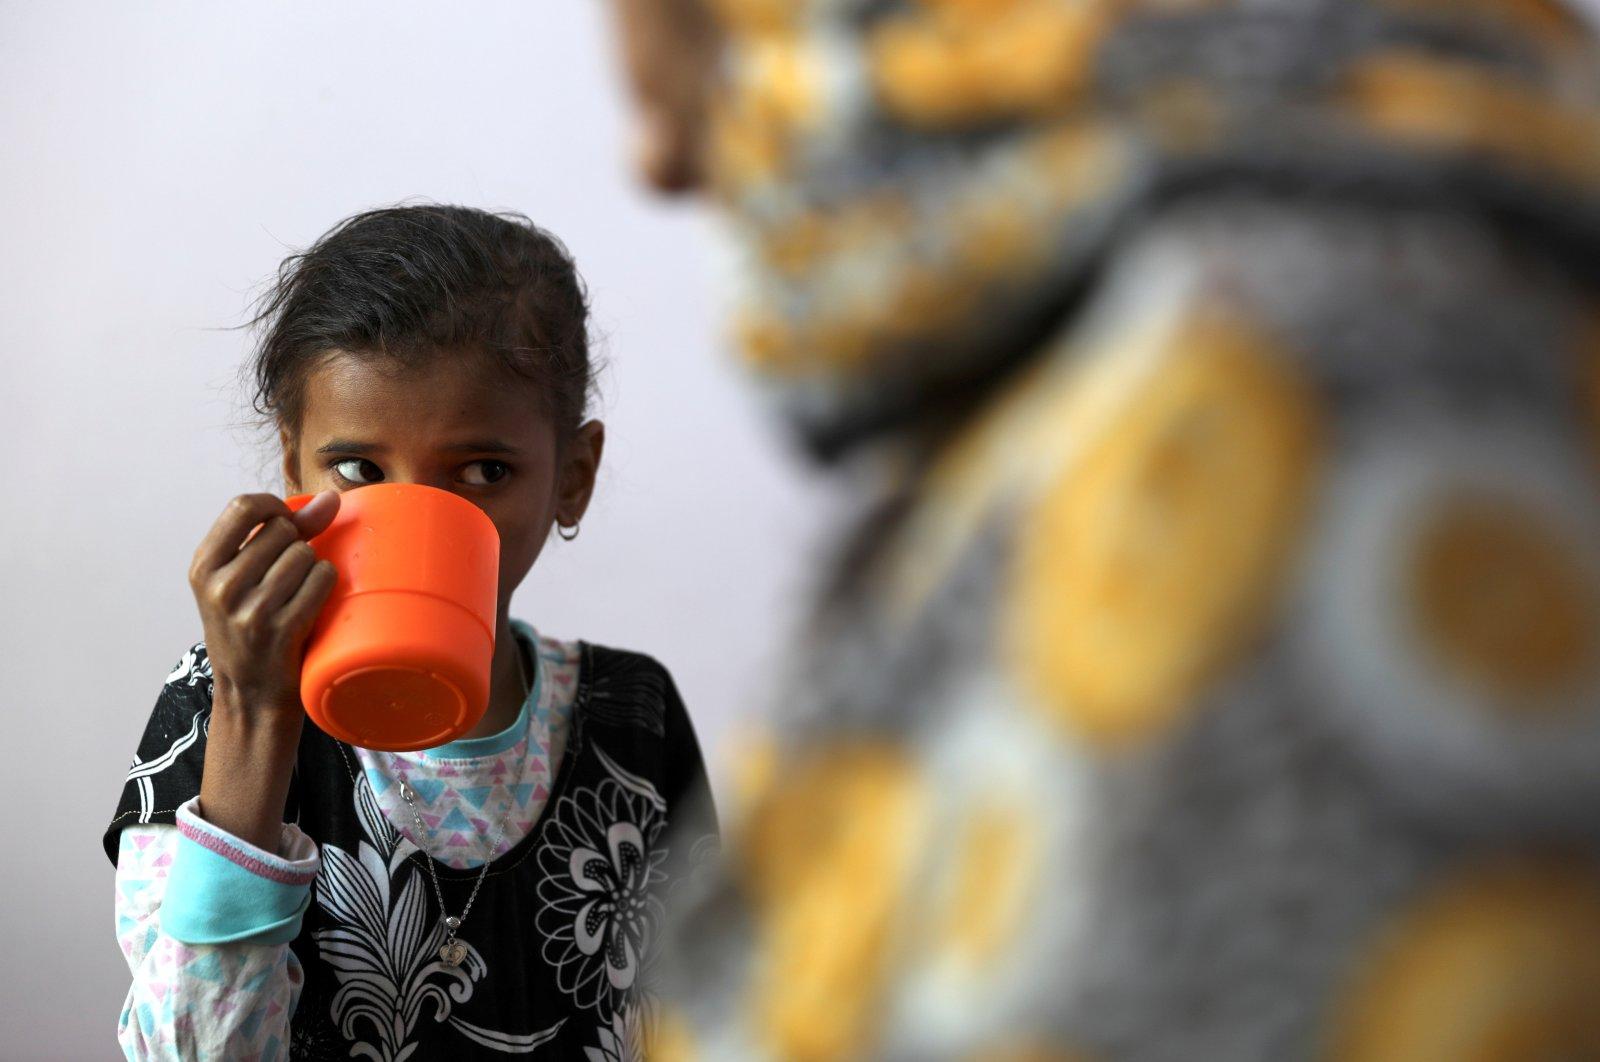 Ahmadiya Juaidi, 13, drinks a supplemental nutrition shake at a malnutrition treatment ward of al-Sabeen hospital in Sanaa, Yemen, Feb. 24, 2021. (Reuters Photo)